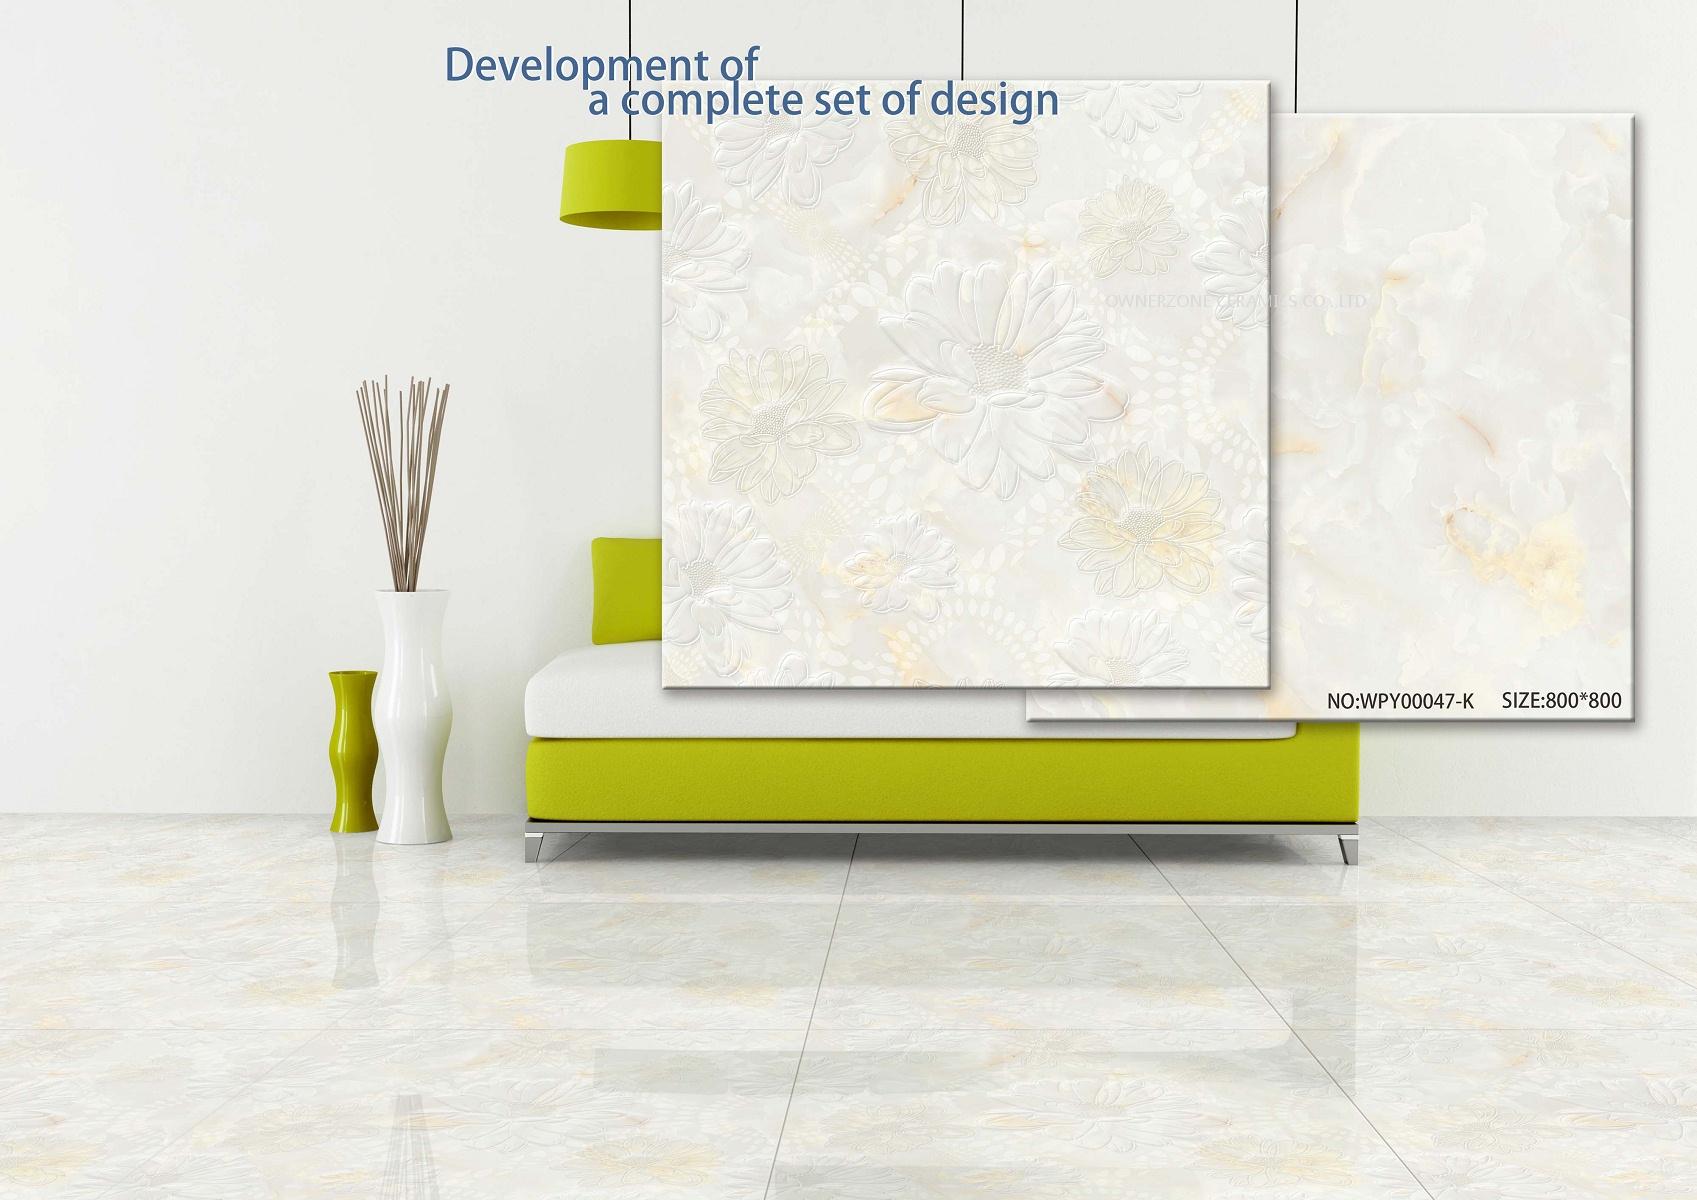 The design of flower series of new watermark